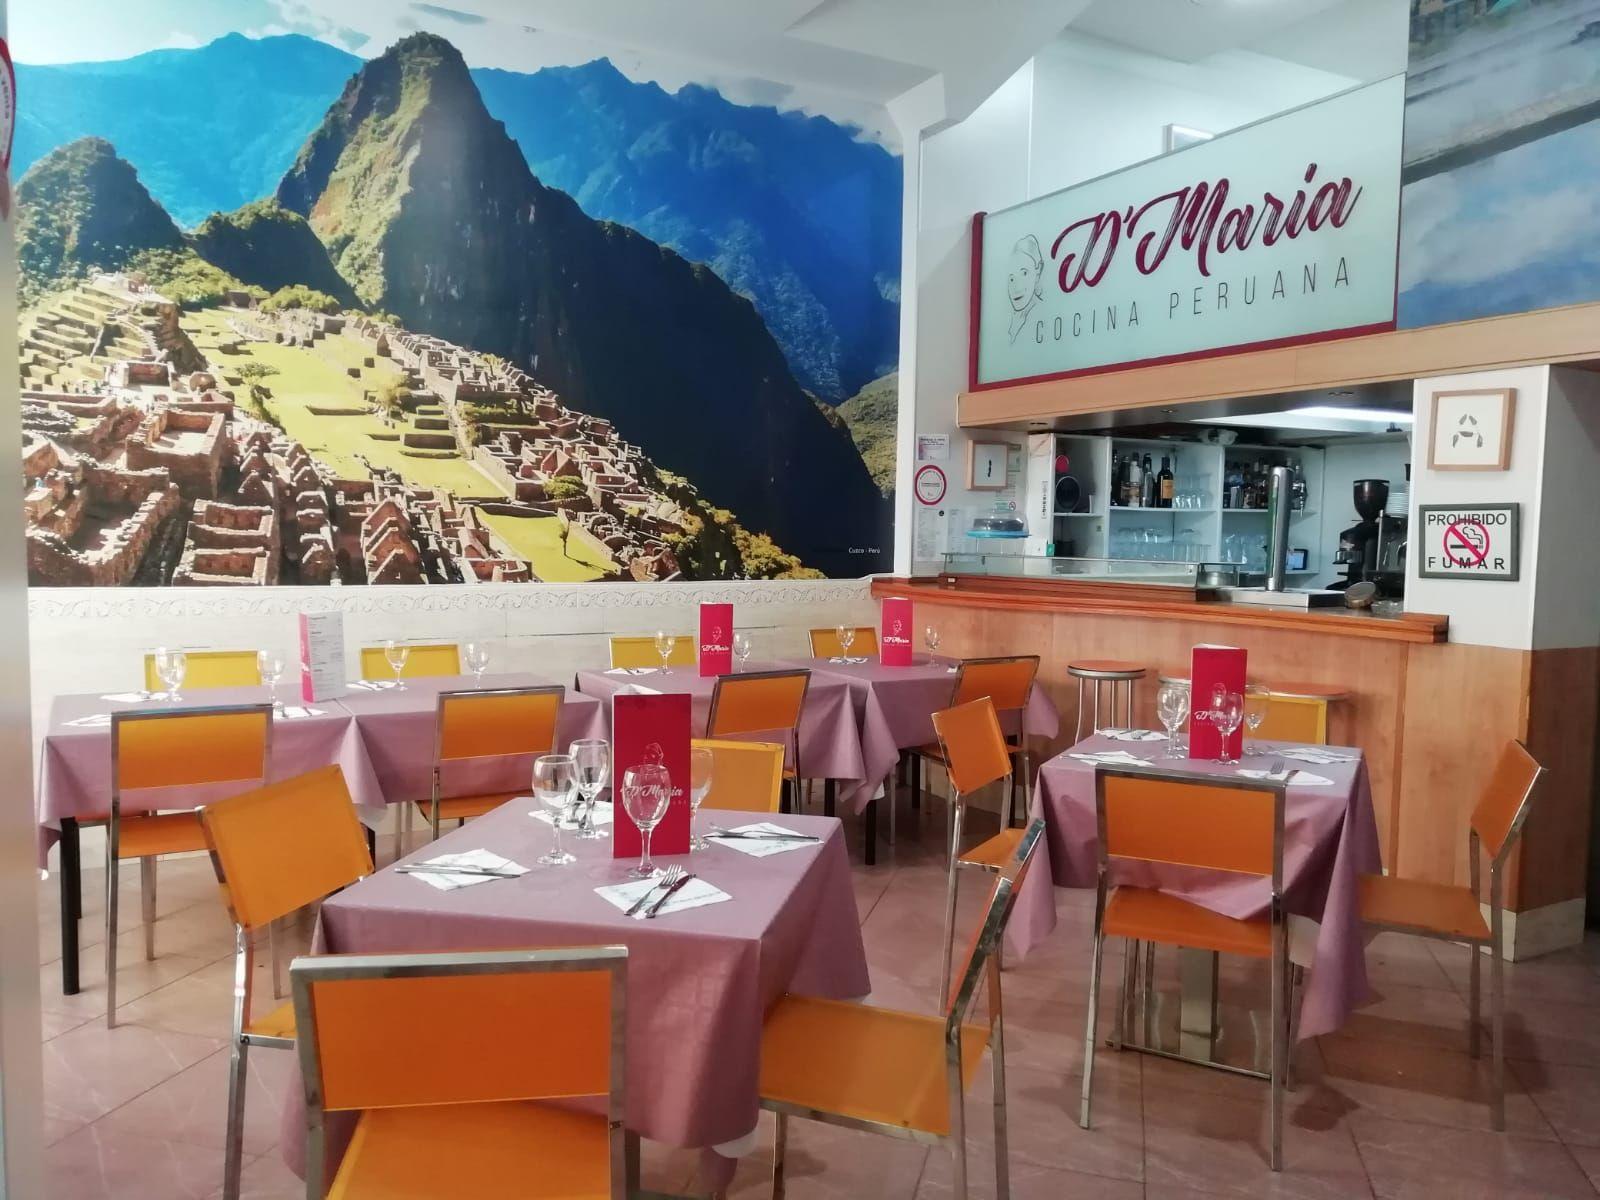 Foto 40 de Cocina peruana en  | TIKA MARILLA